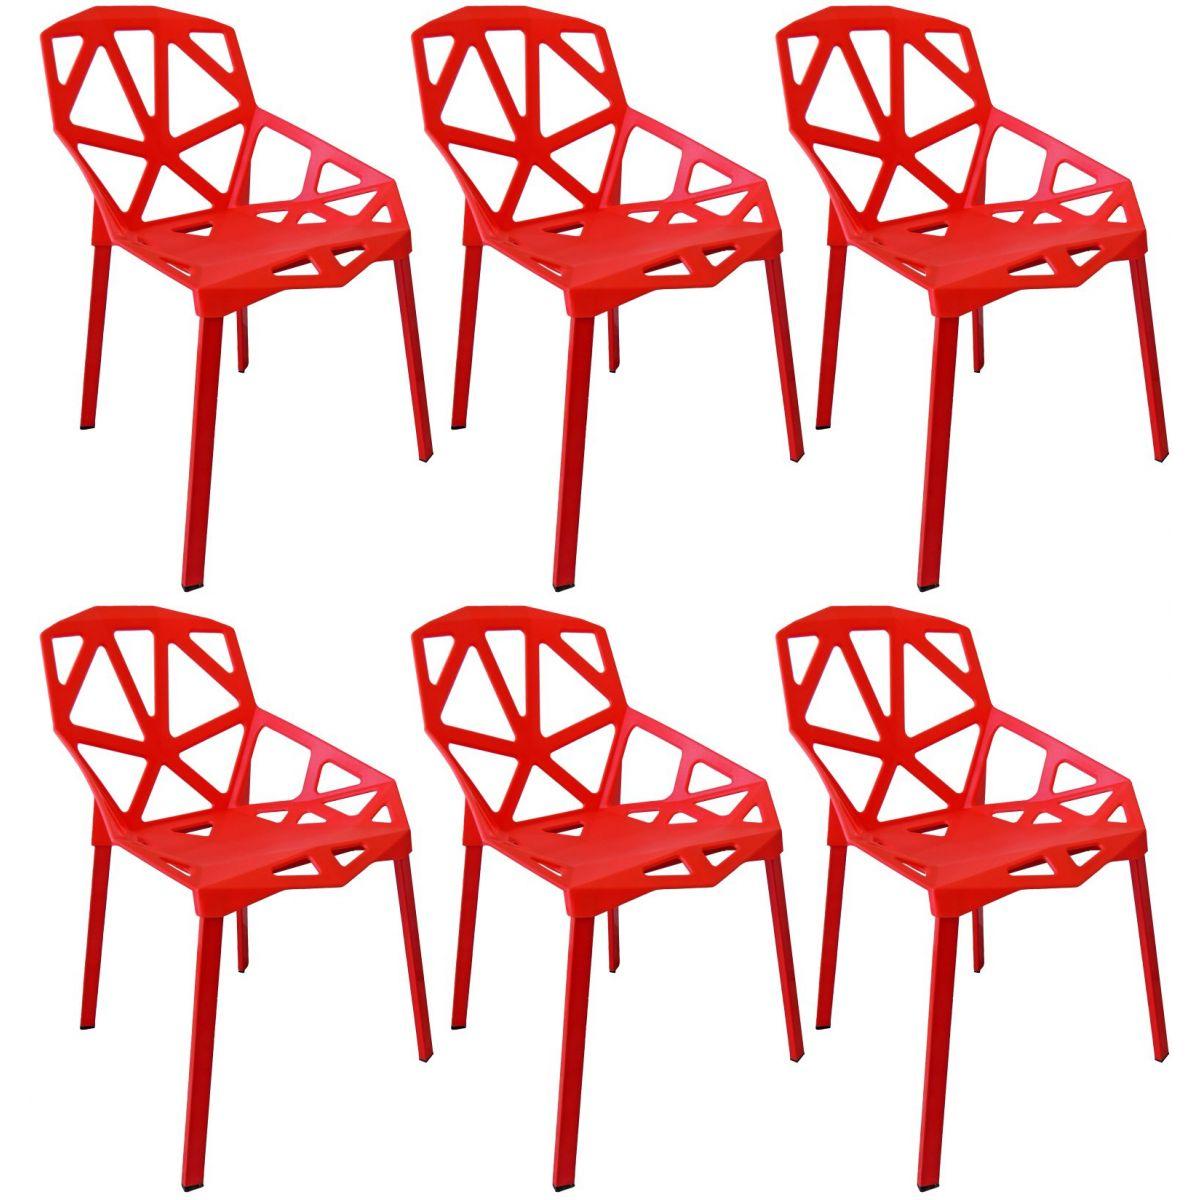 Kit 6 Cadeiras Design Penelope Chair One Pelegrin PEL-1335 Cor Vermelha